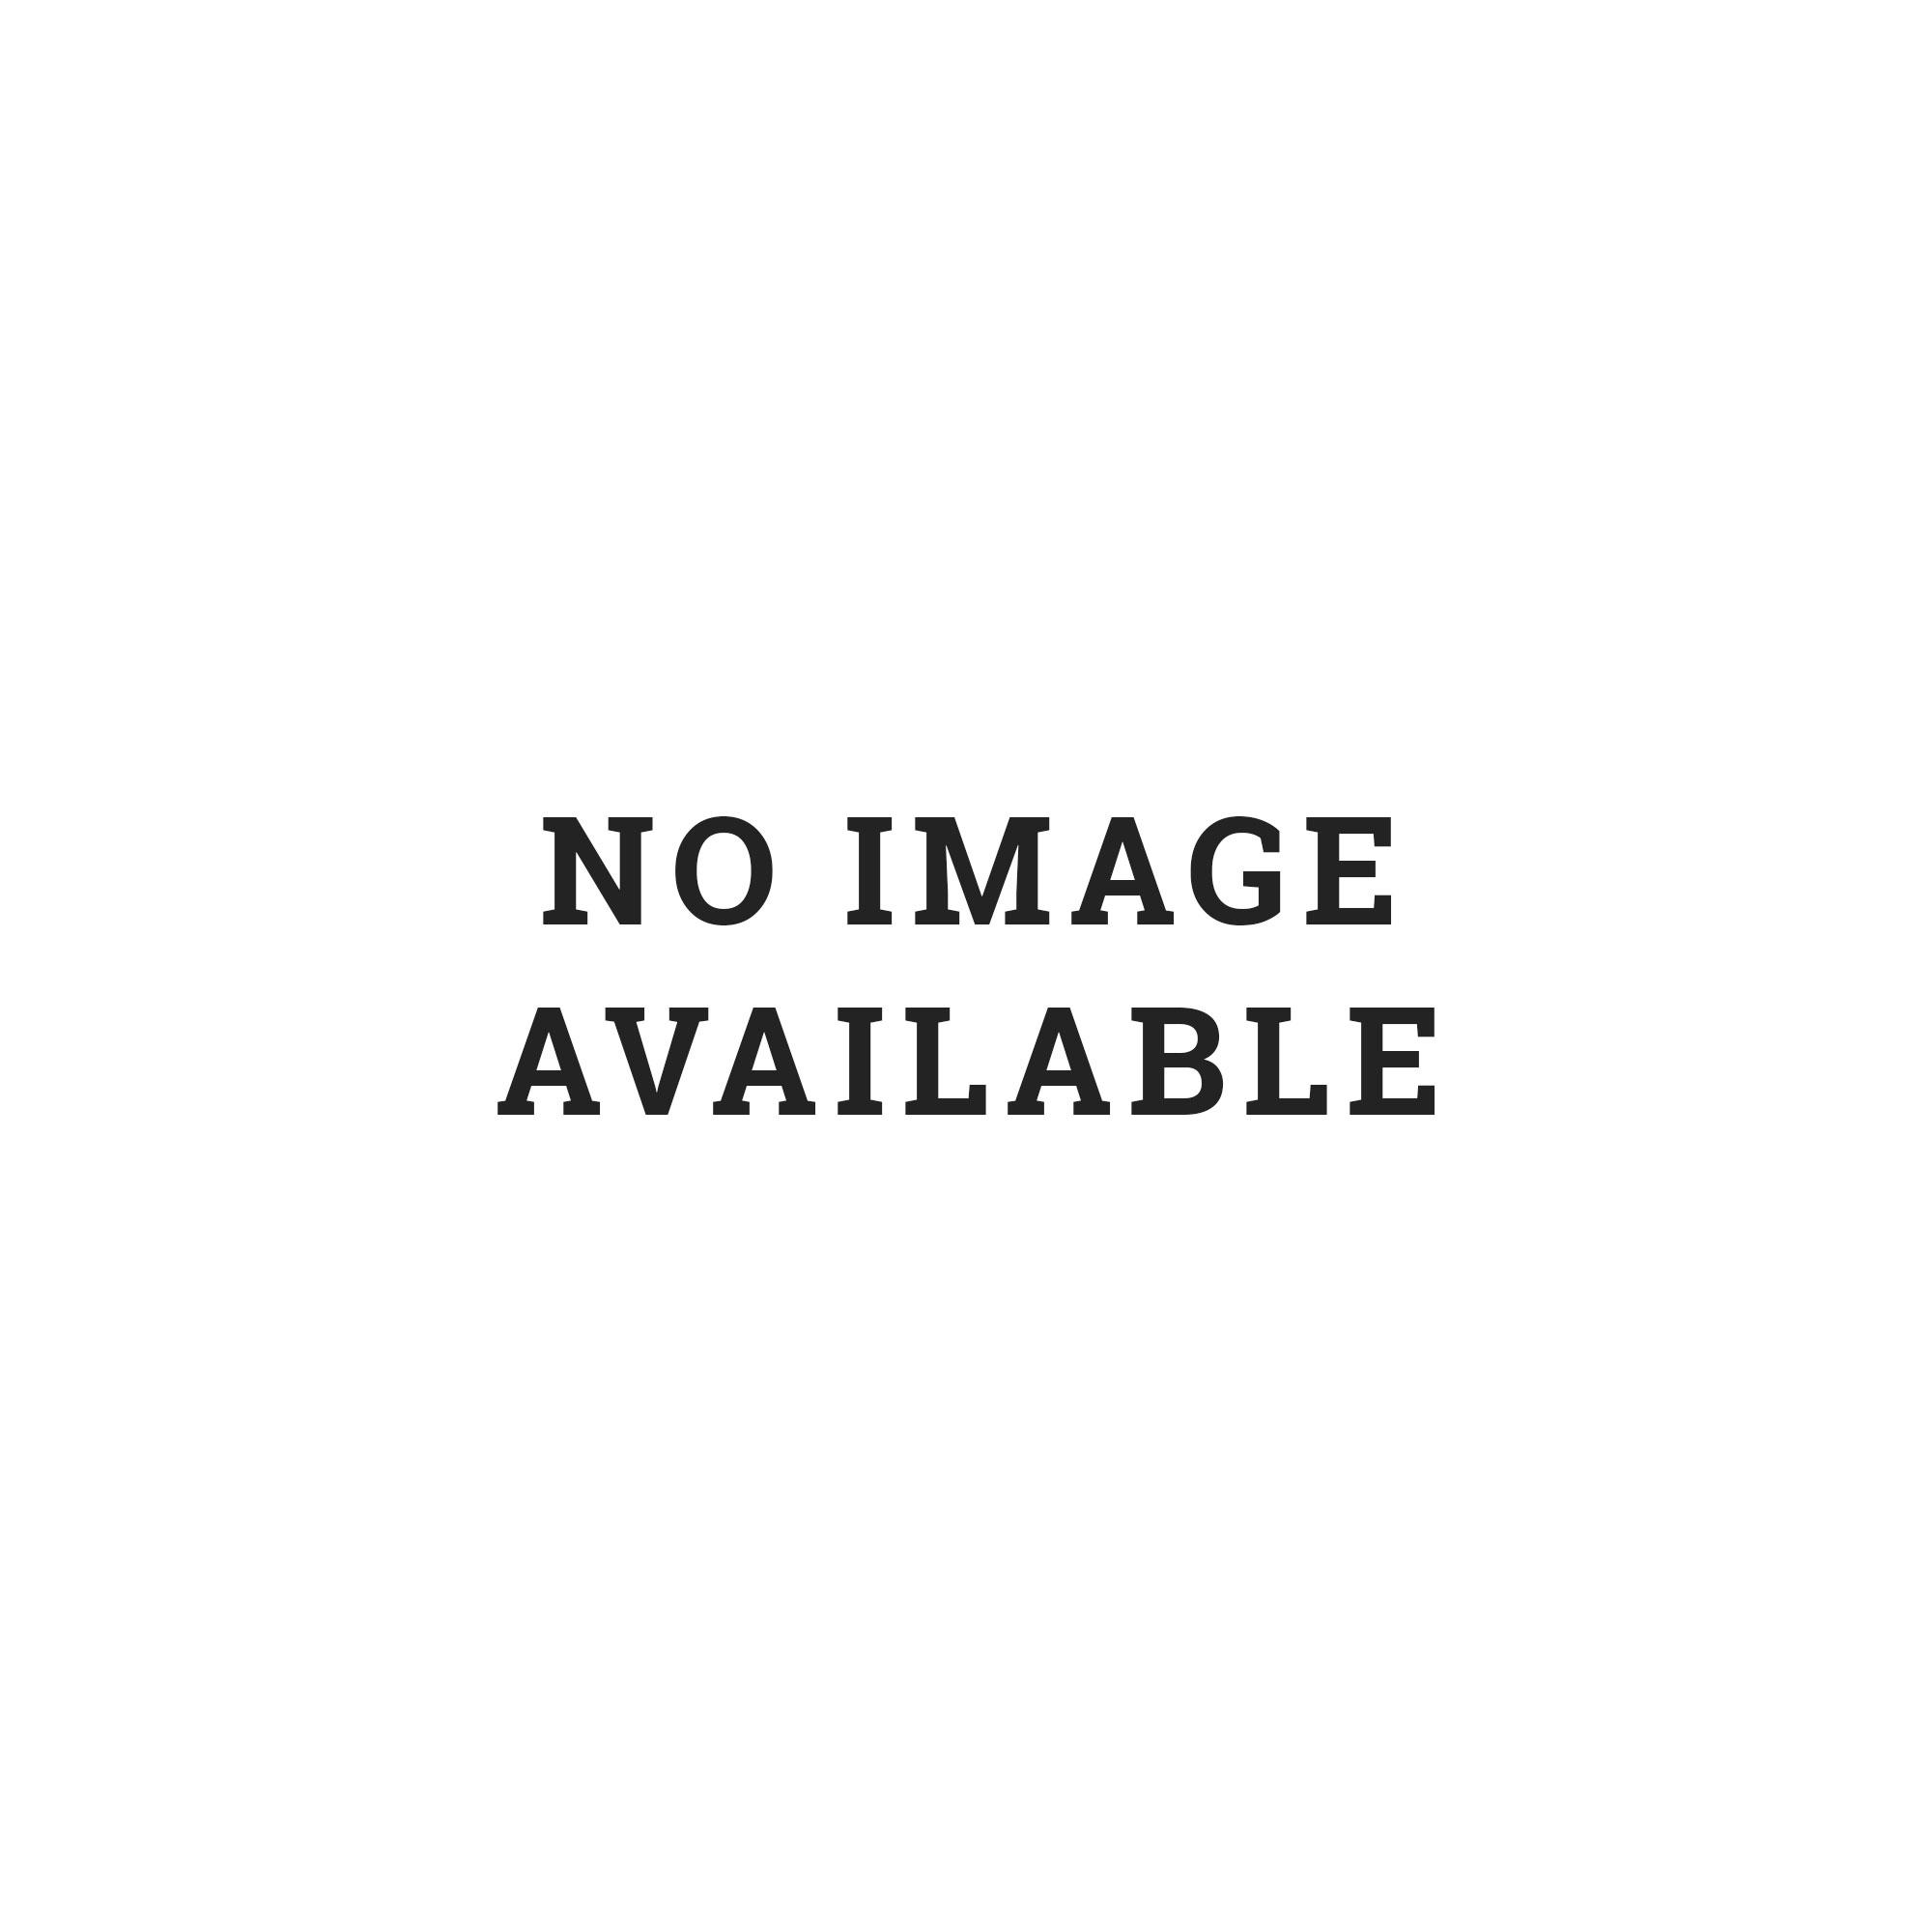 Vans VN0003CAATM Sk8-Hi Reissue Mens Canvas Skate Shoes - Chili Pepper Red